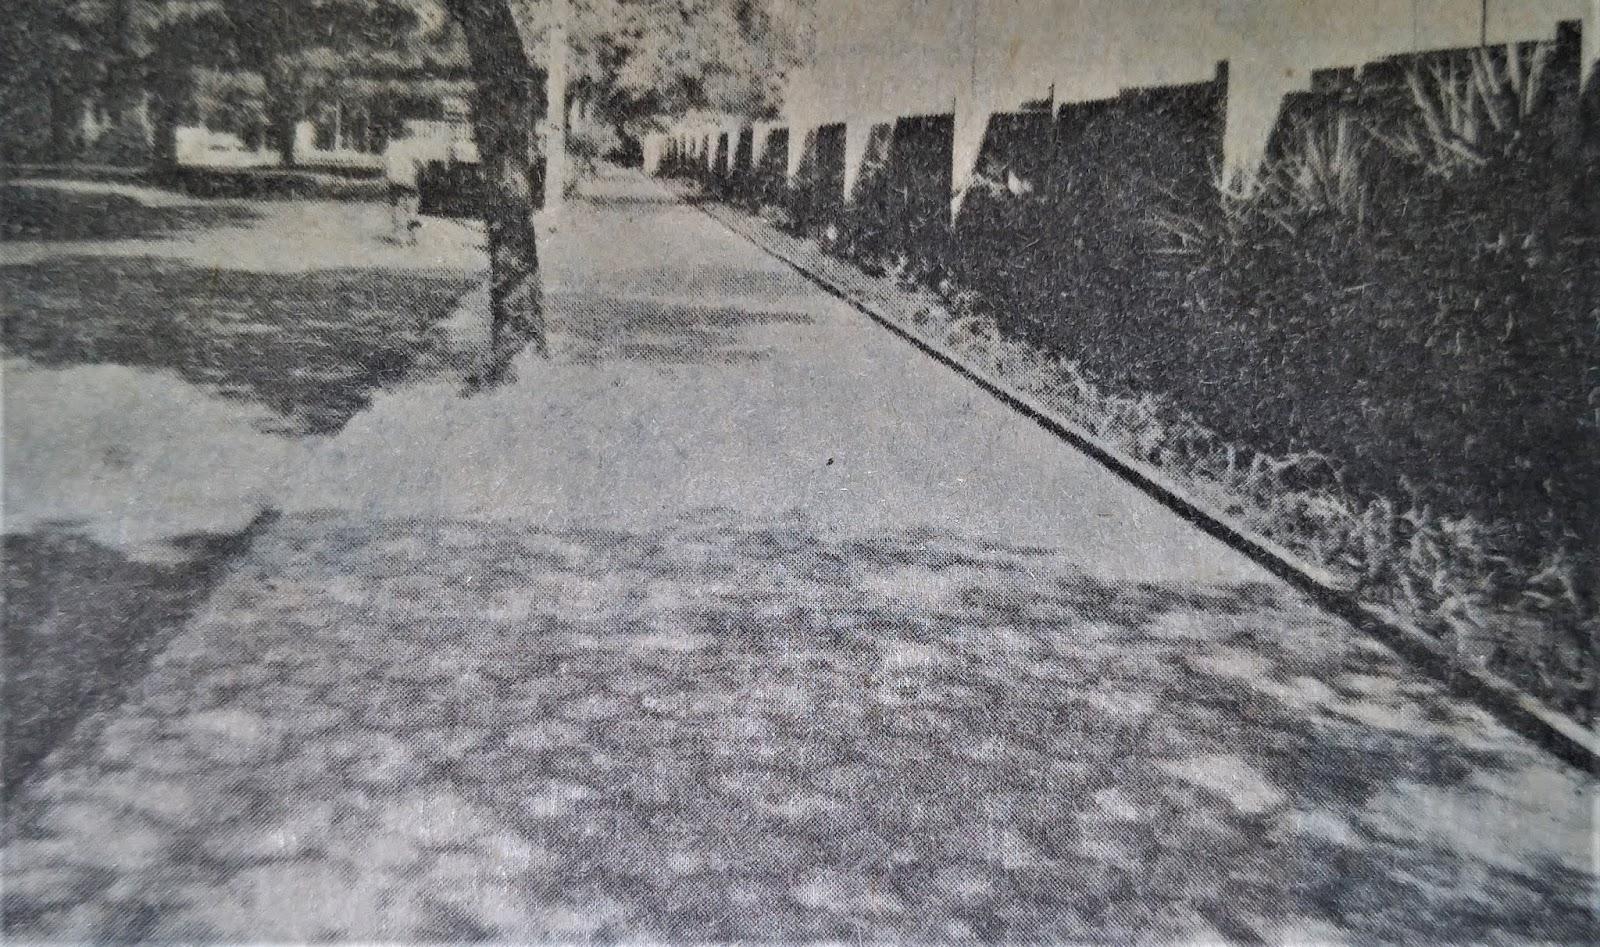 Avenida Tamandaré - 1985